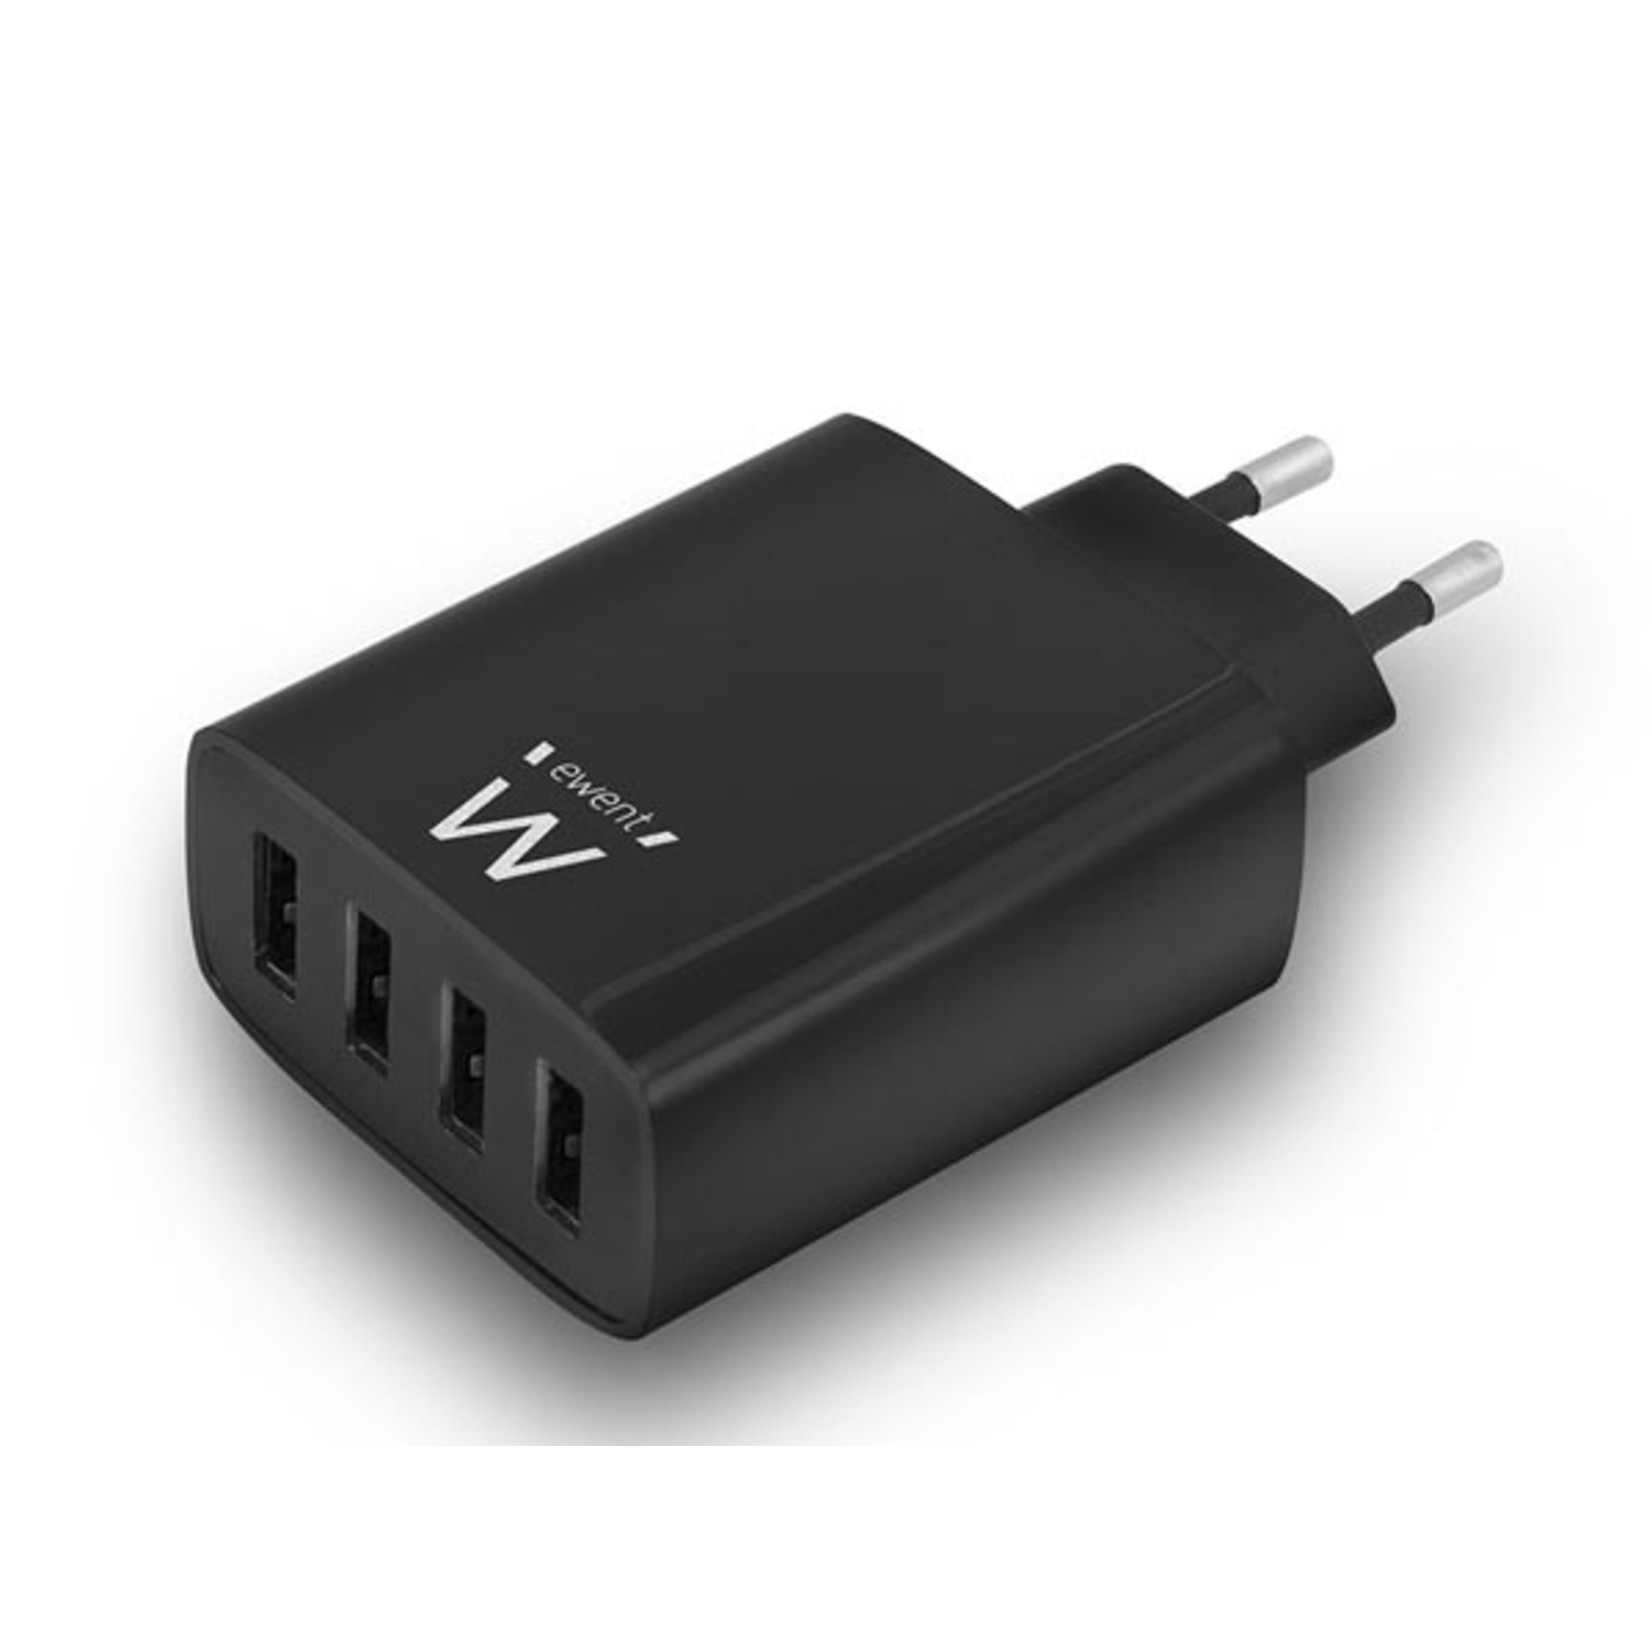 Velleman 4 PORT USB SMART CHARGER 5.4 A